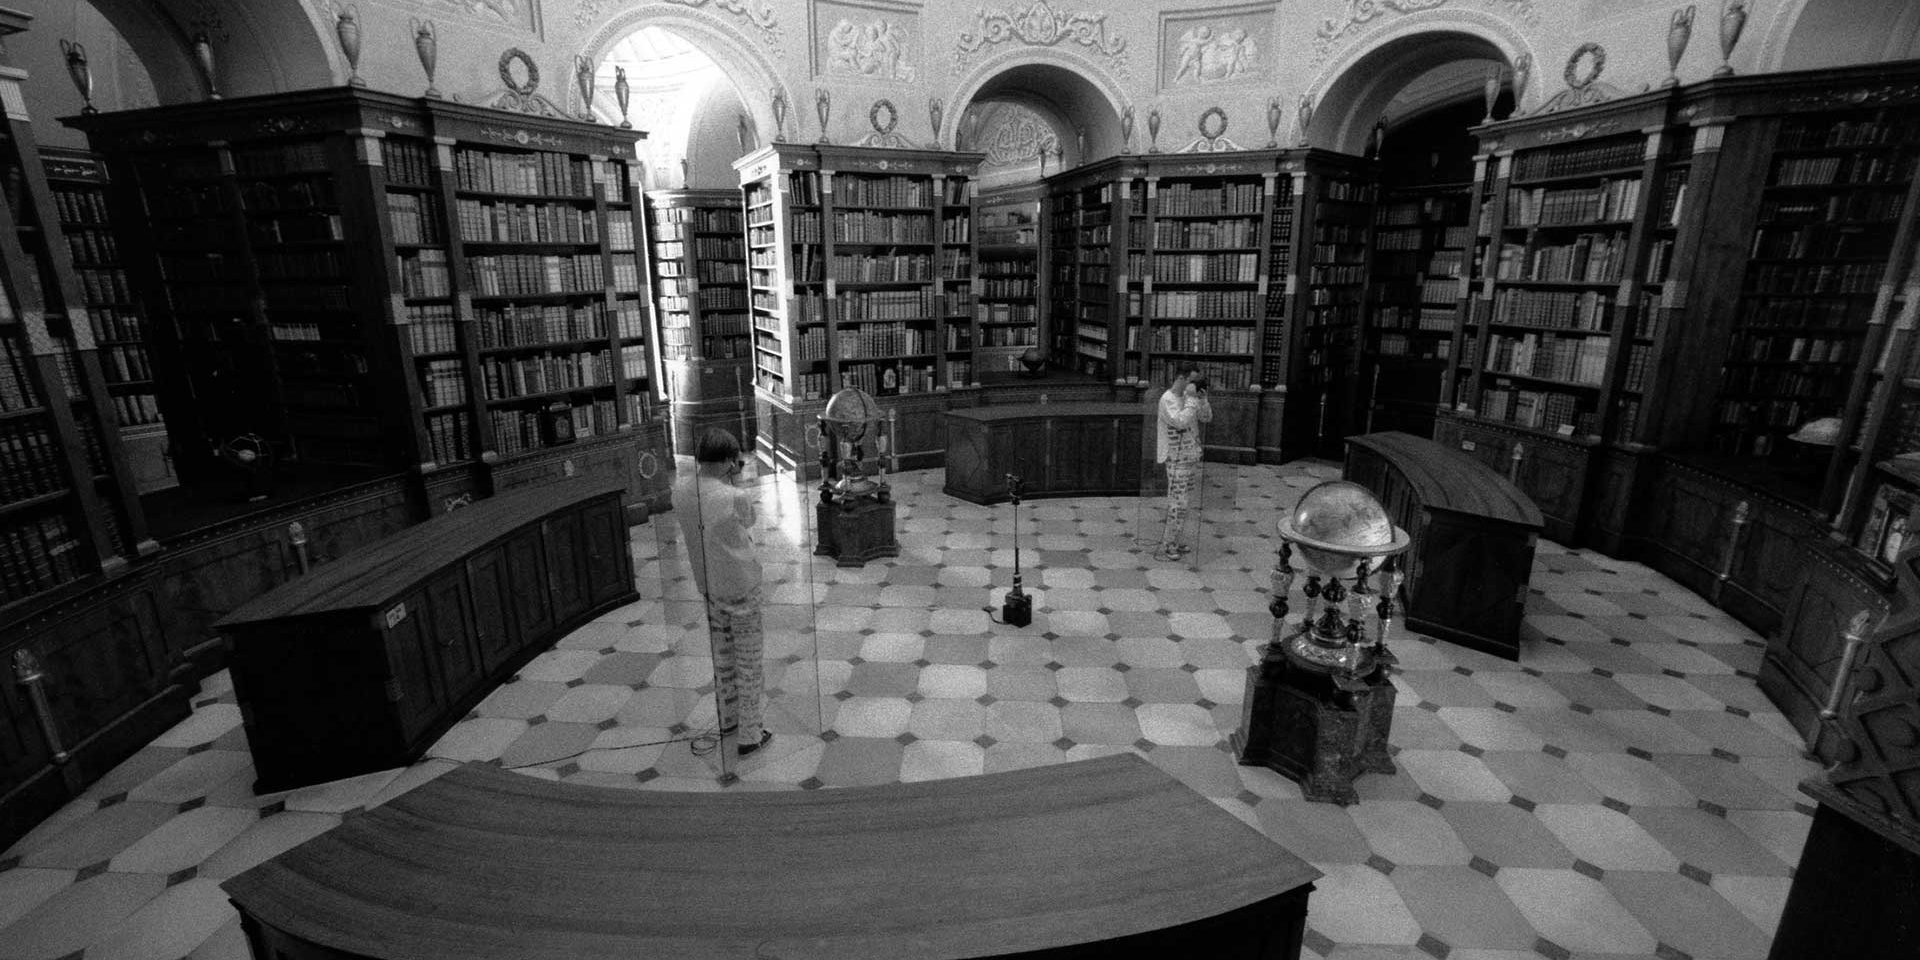 Visus Sensus – Stiftsbibliothek Klosterneuburg, 1994